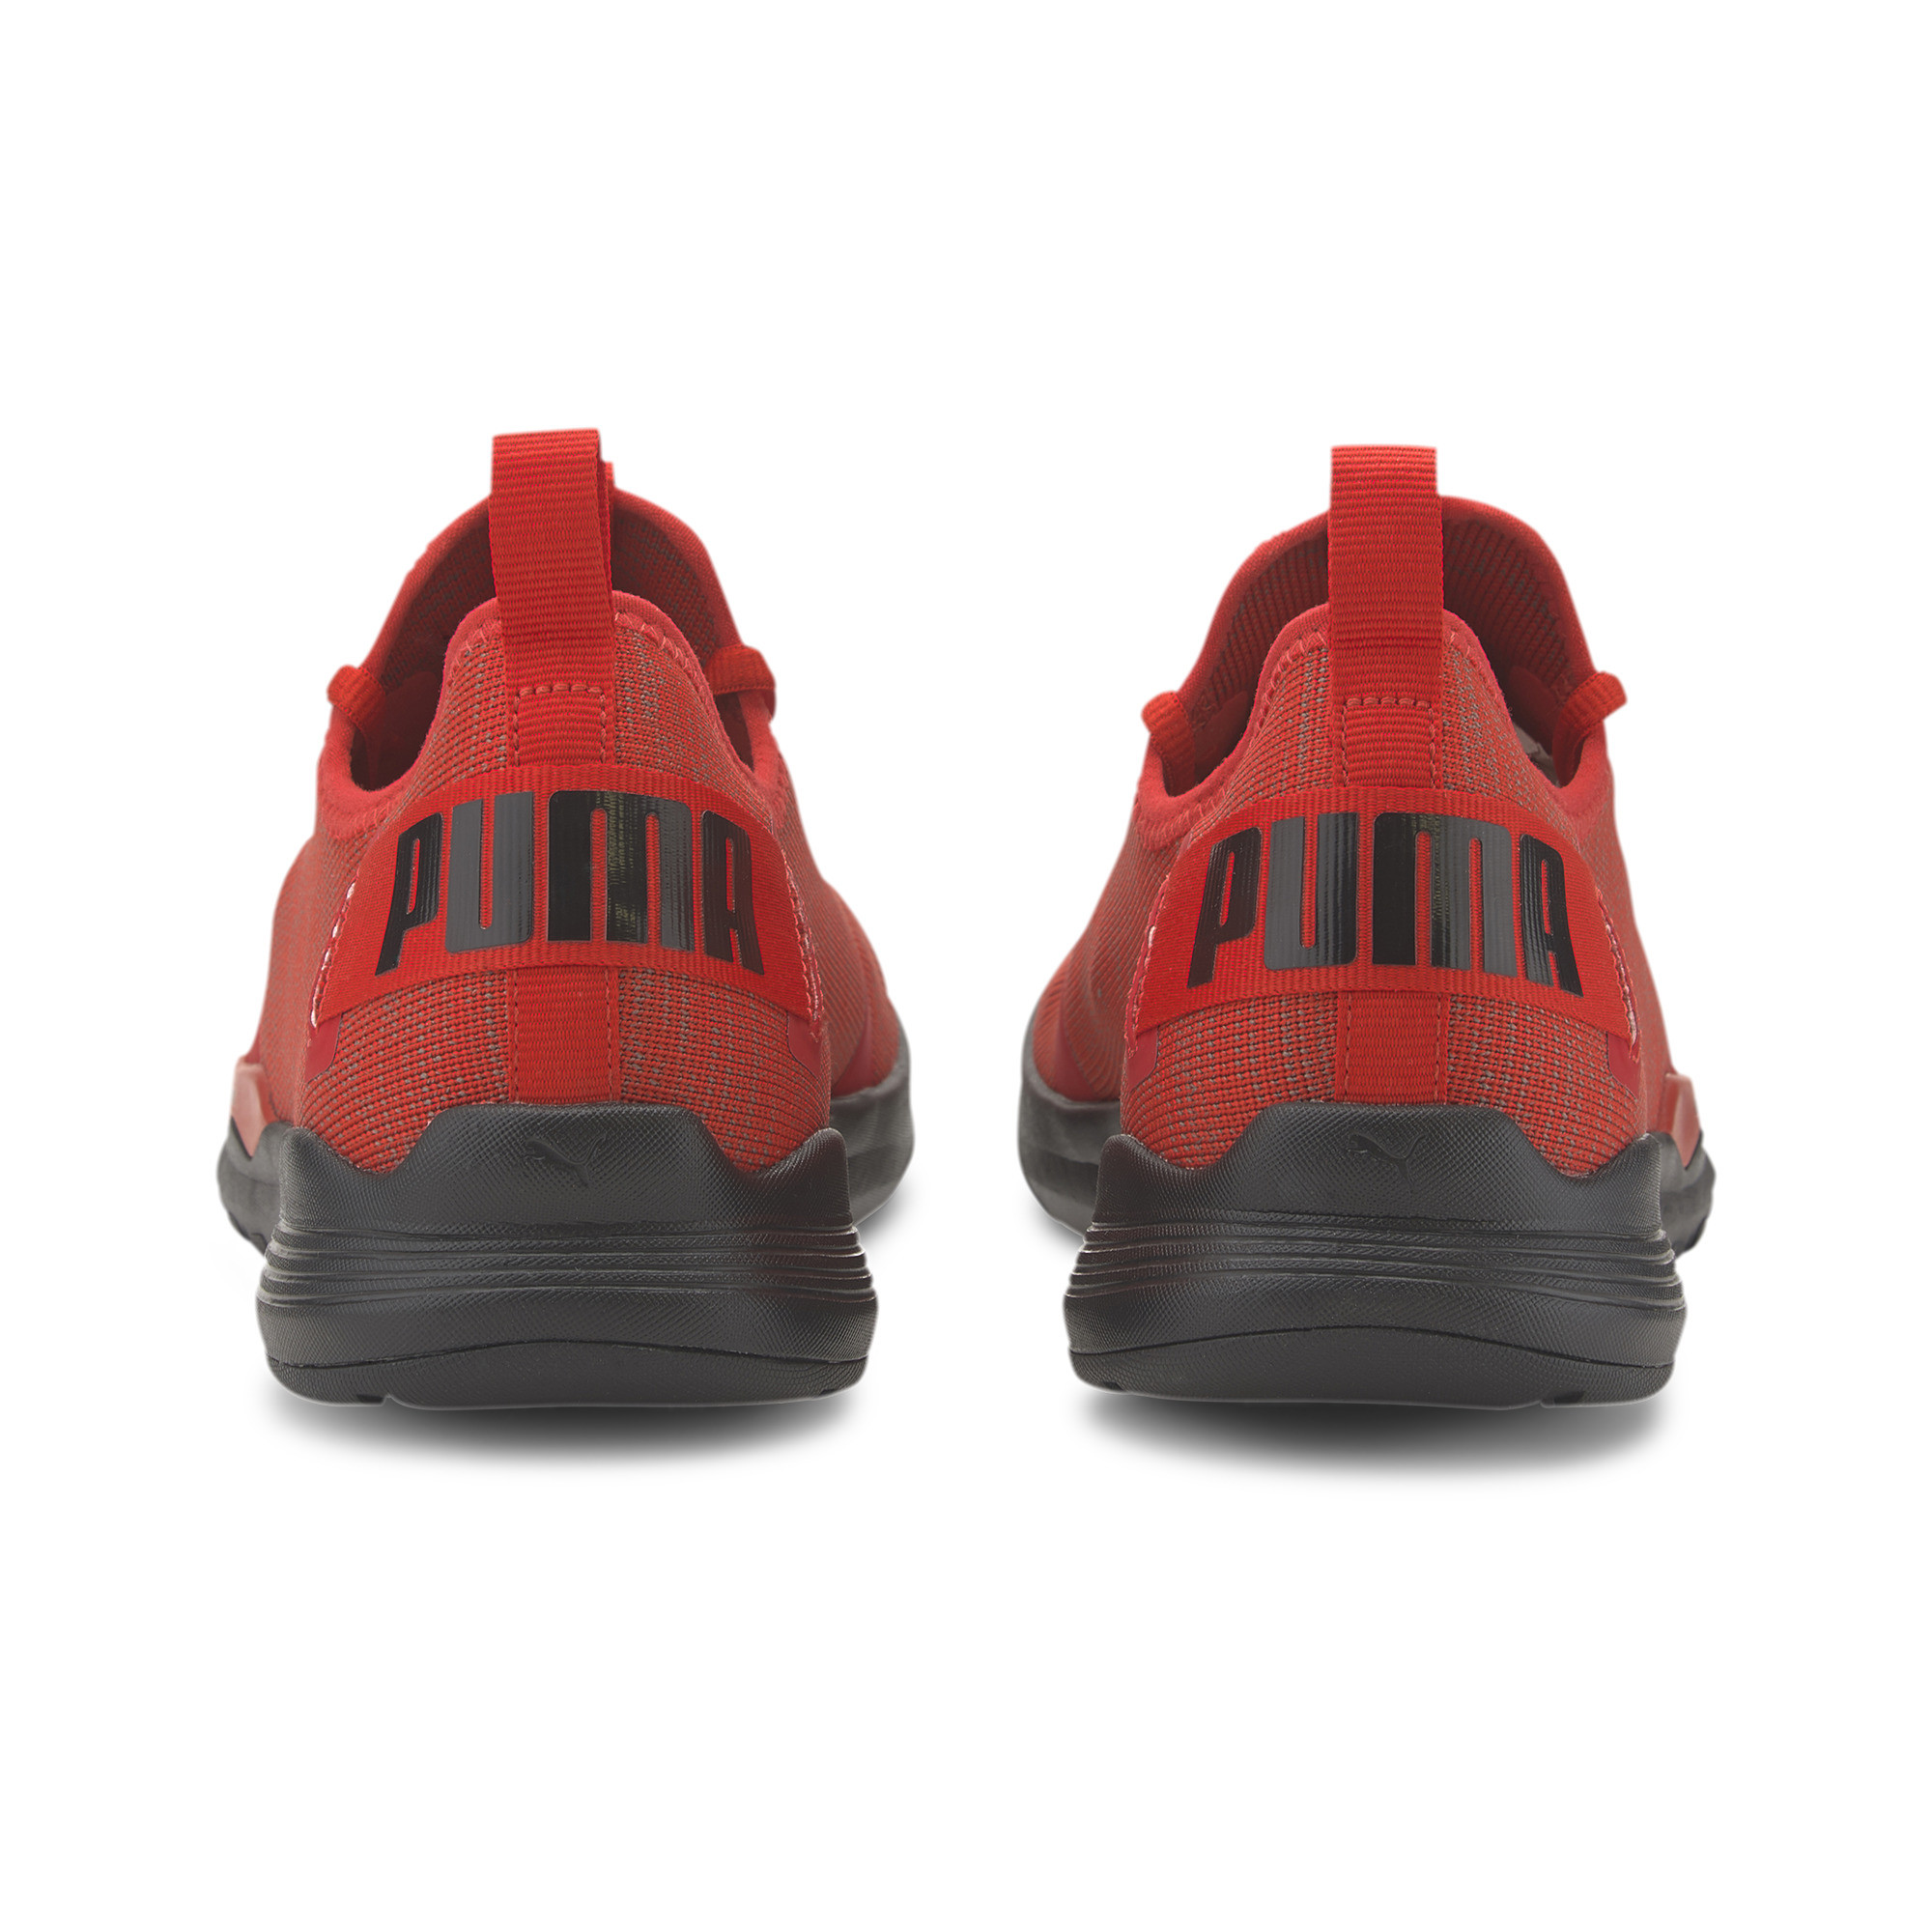 PUMA-Men-039-s-IGNITE-Contender-Knit-Running-Shoes thumbnail 15